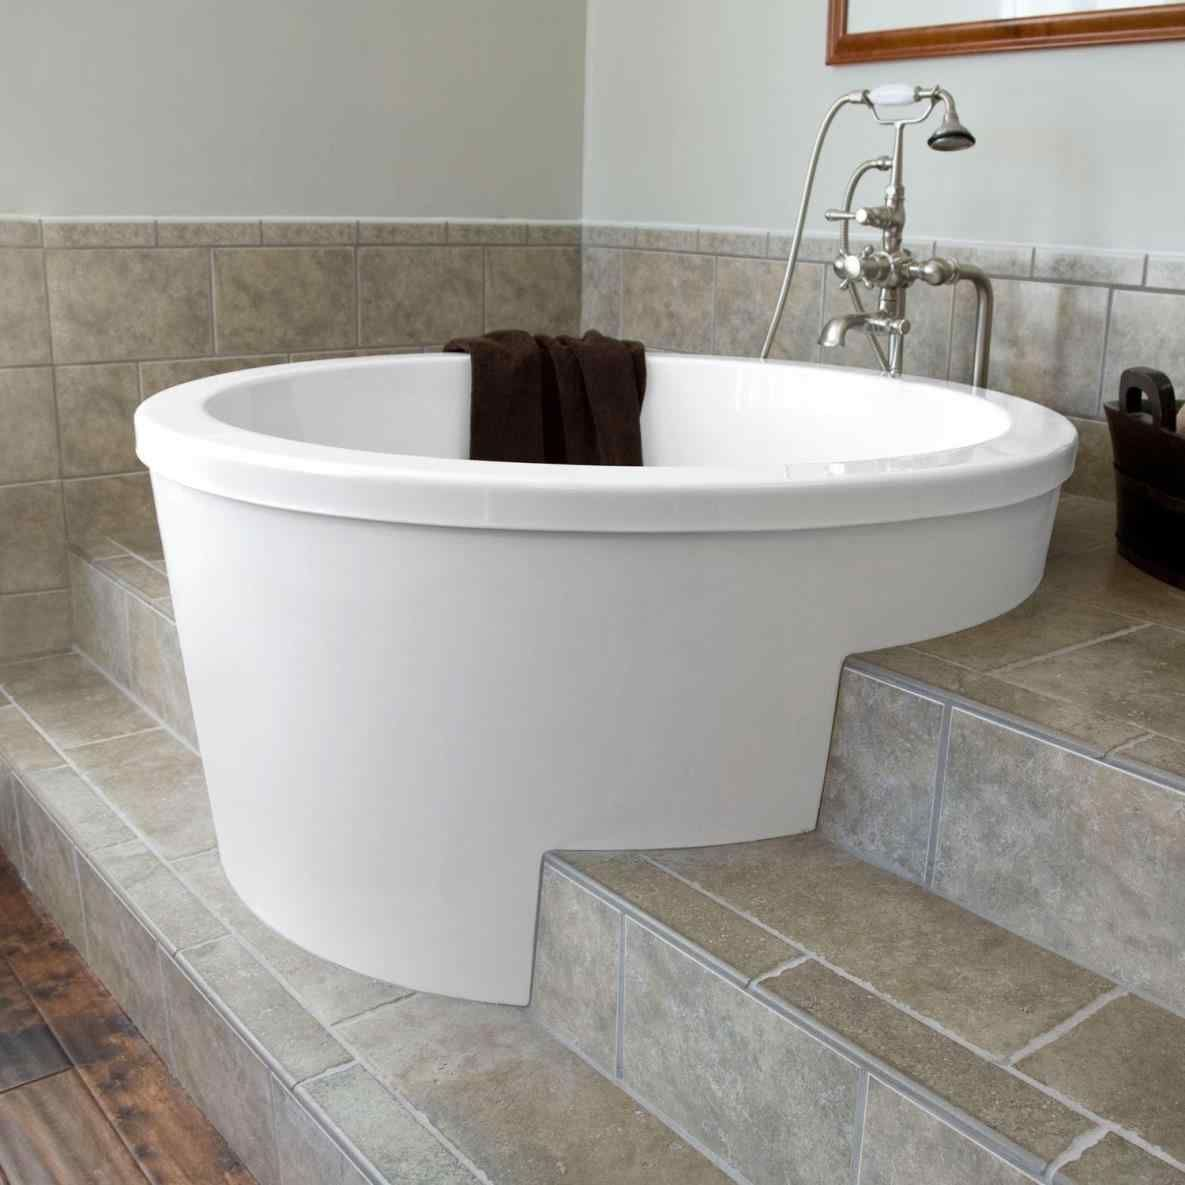 Pin By Mi Homez Journal On Guest Bathroom Japanese Bathroom Soaking Tub Shower Combo Japanese Soaking Tubs